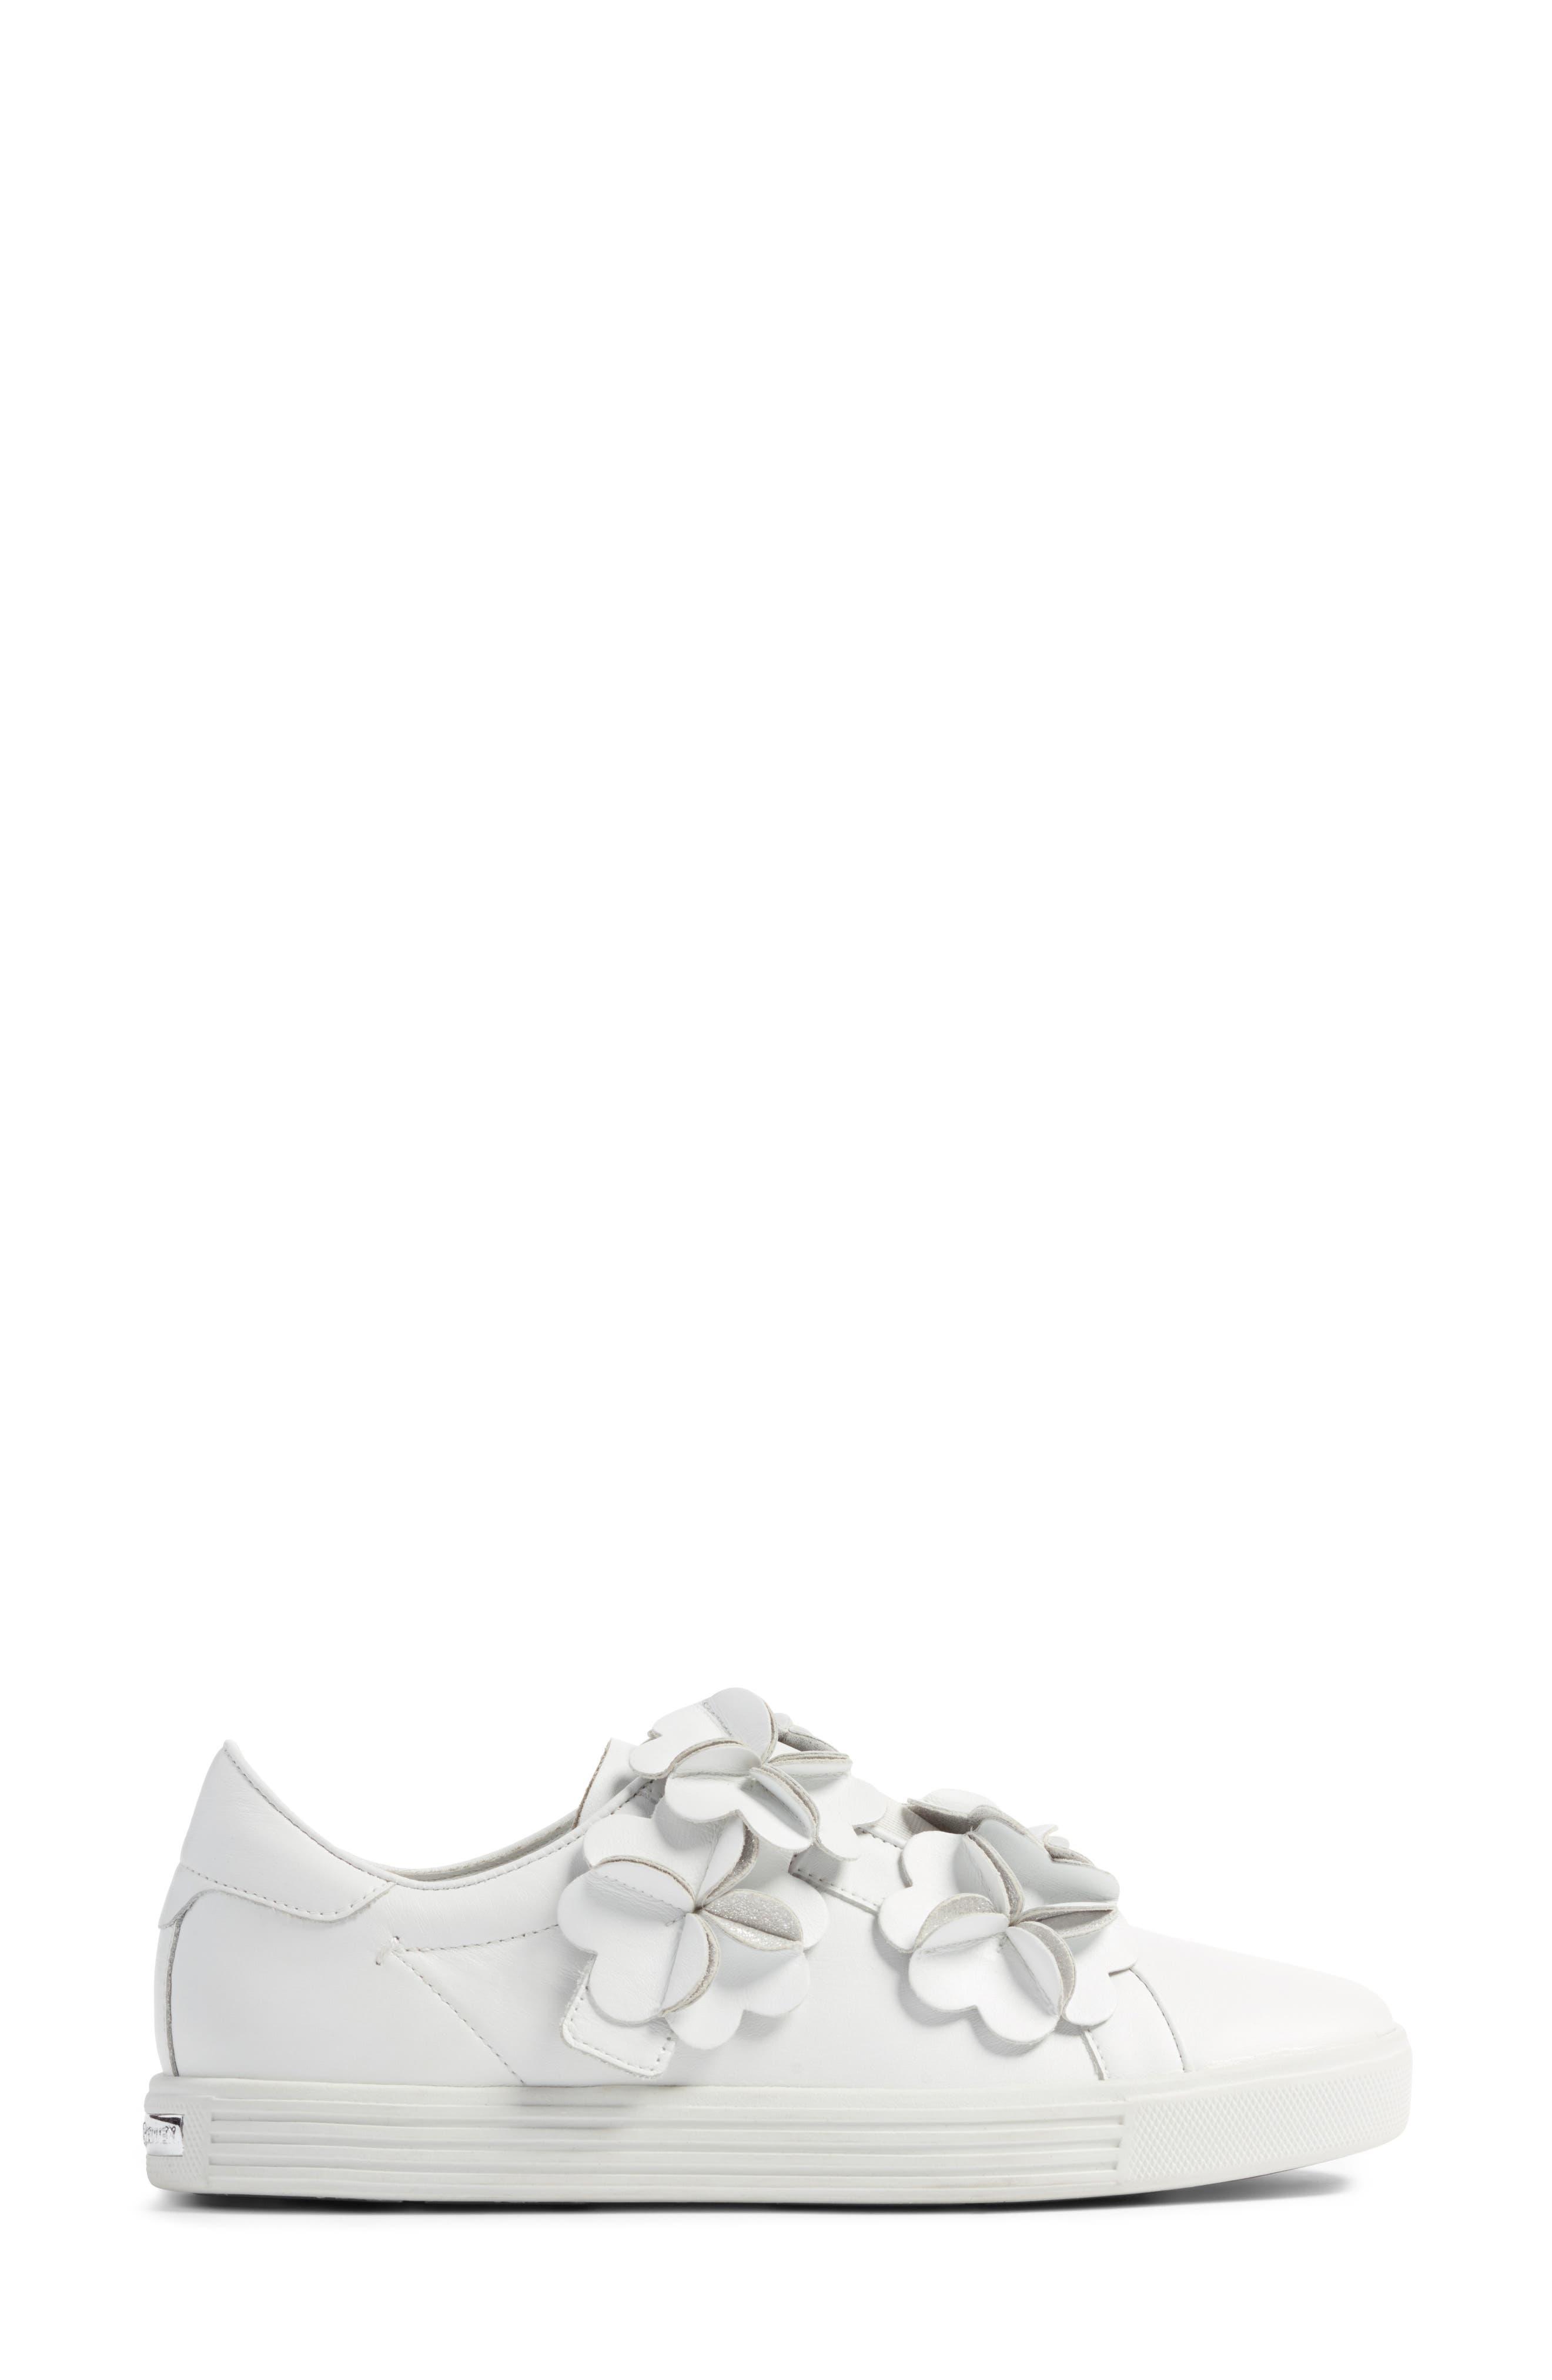 Kennel & Schmenger Town Floral Embellished Sneaker,                             Alternate thumbnail 3, color,                             White/ Silver